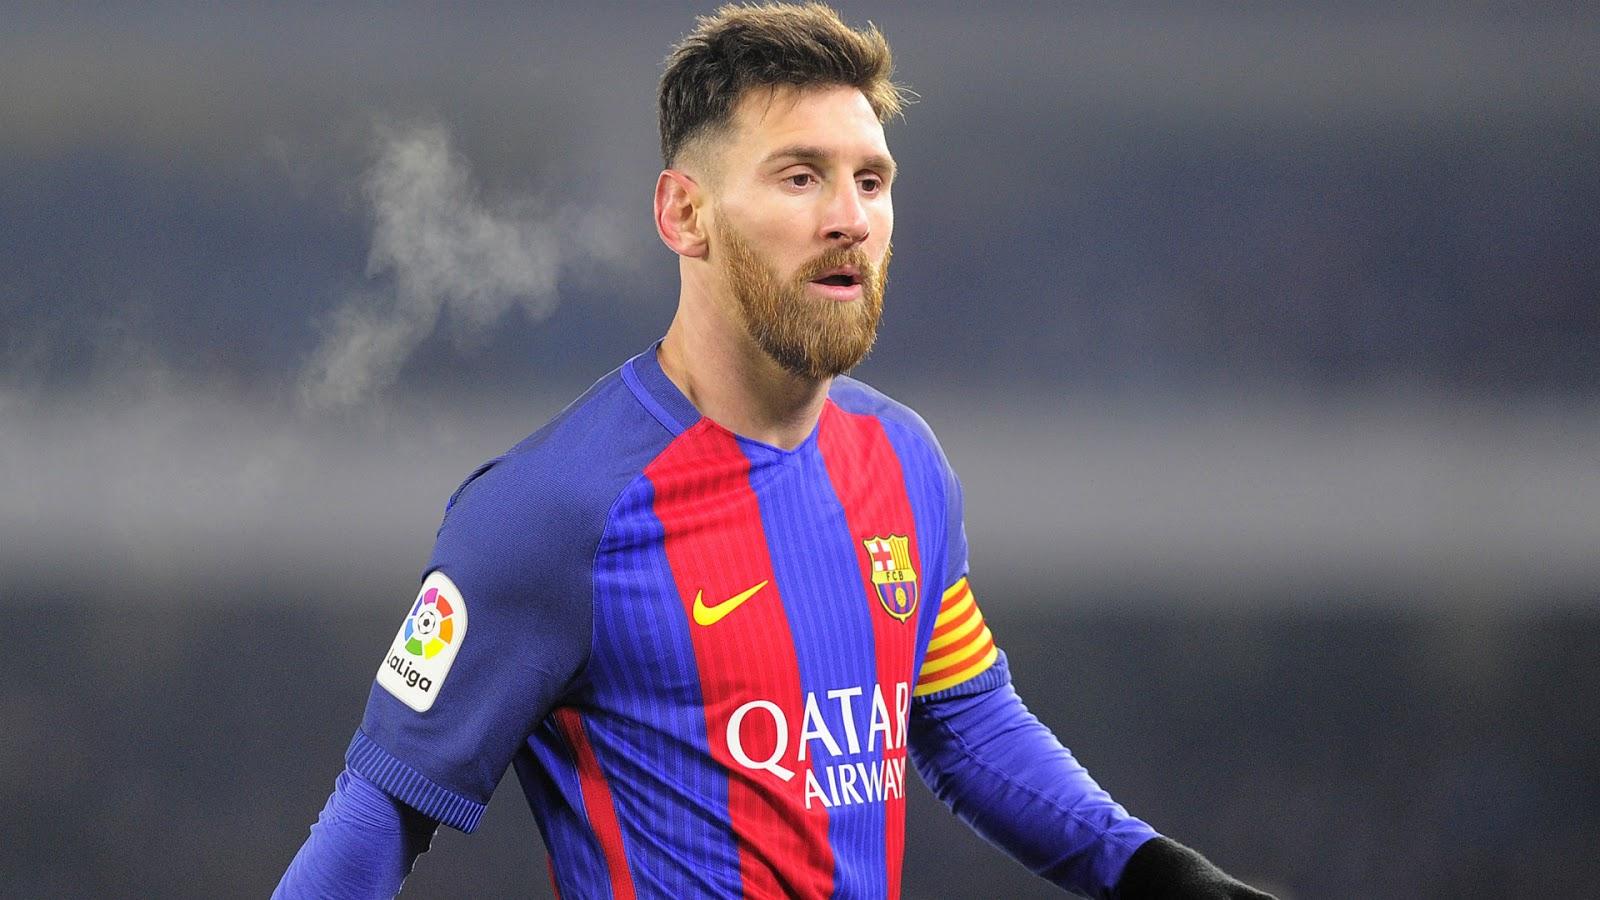 31 Lionel Messi Wallpapers Free Download Wallpaper Carax